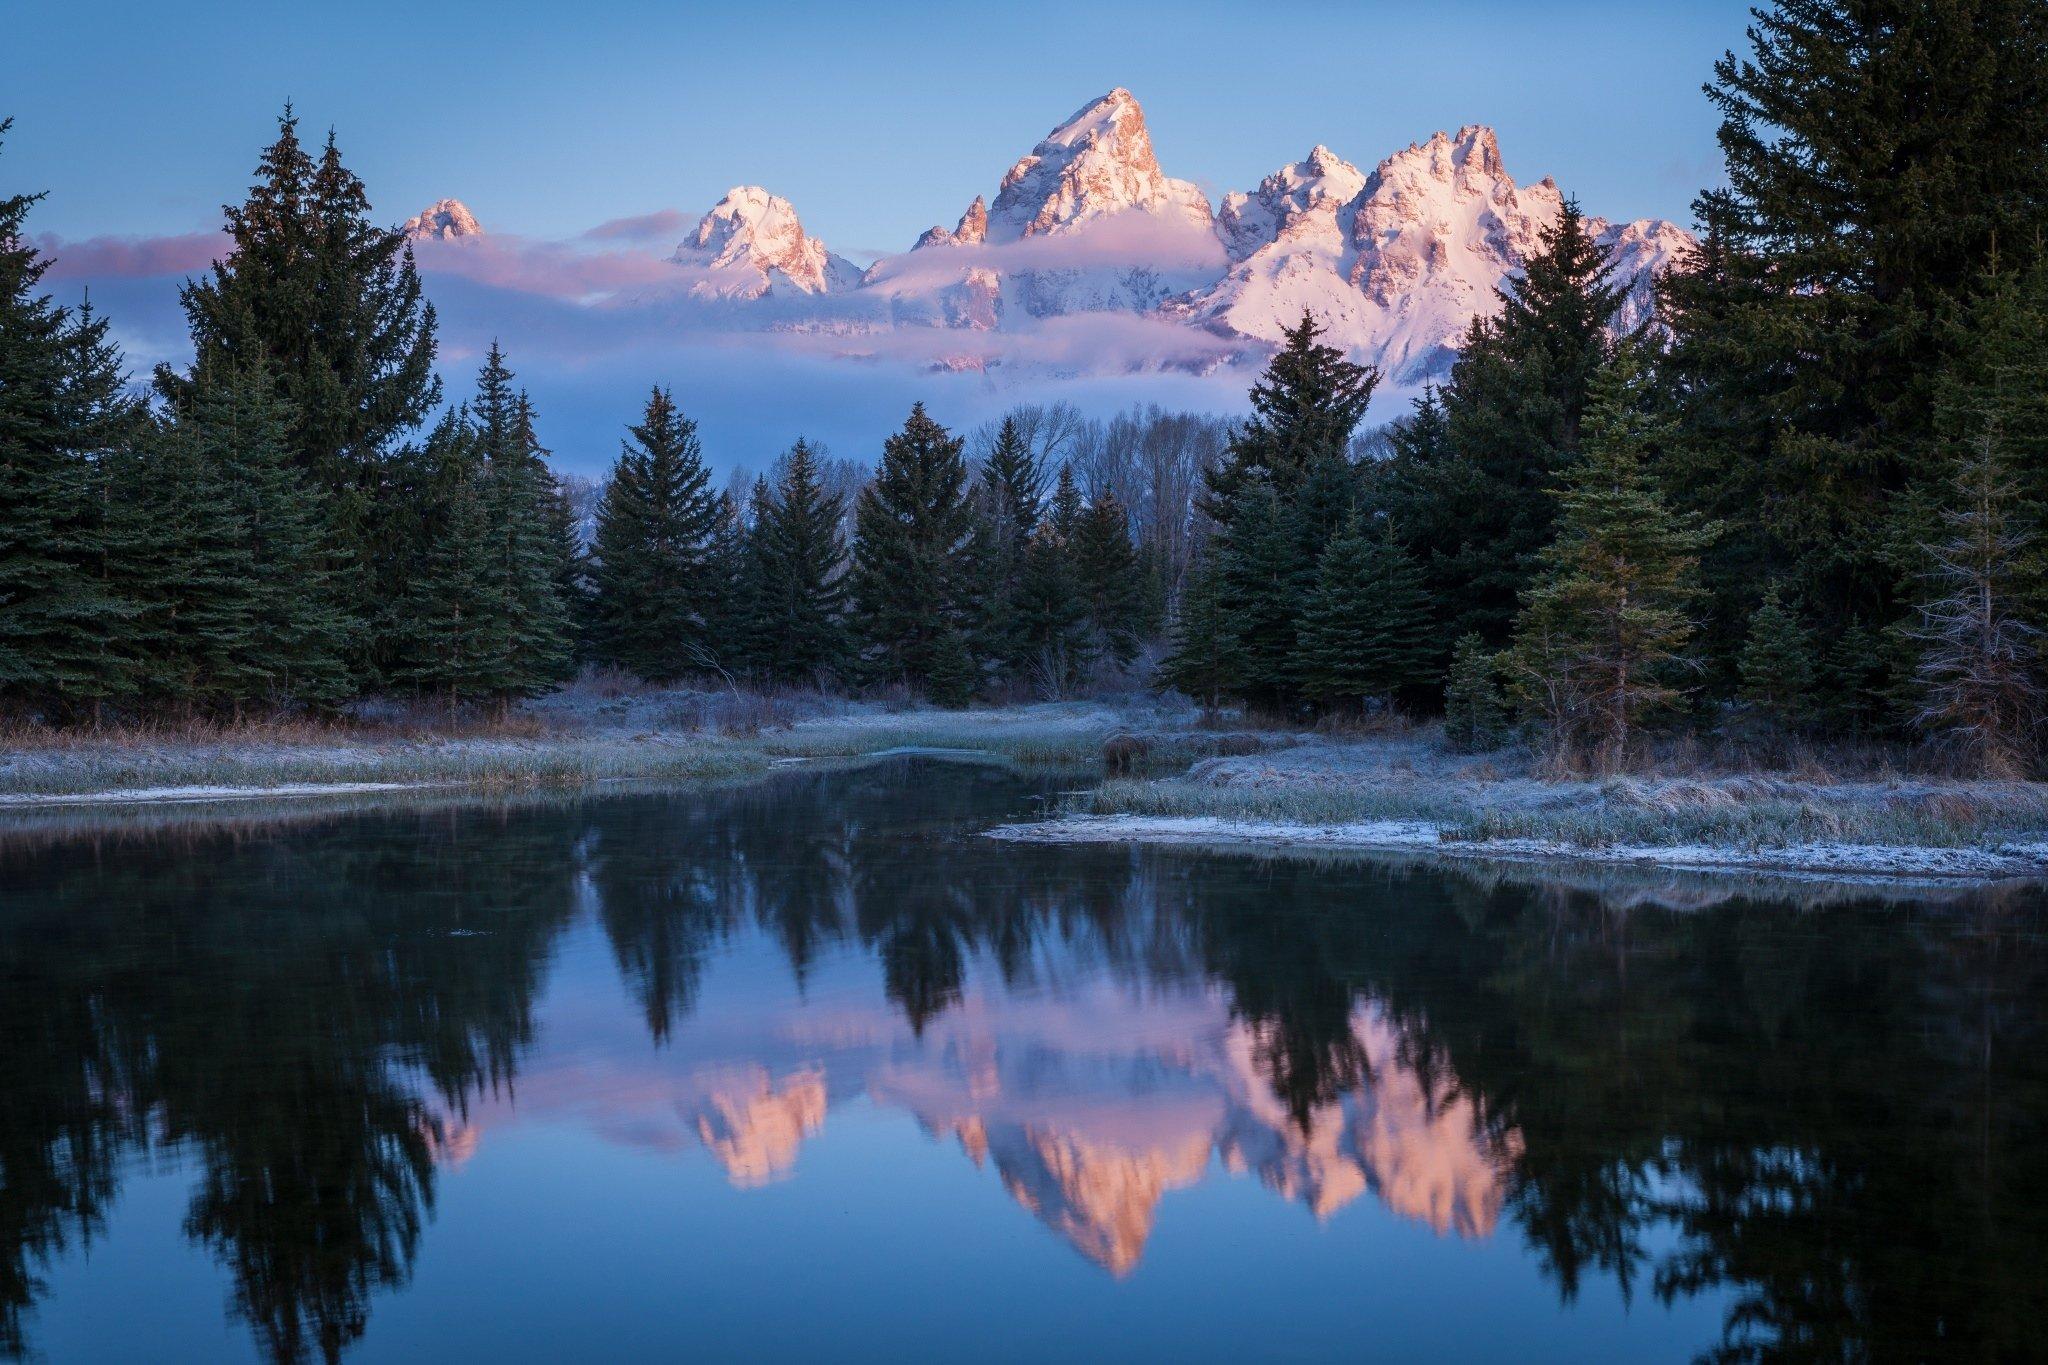 Fall Wallpapers For Desktop Idaho Grand Teton Wyoming Usa Wyoming Usa Sky Mountains Snow